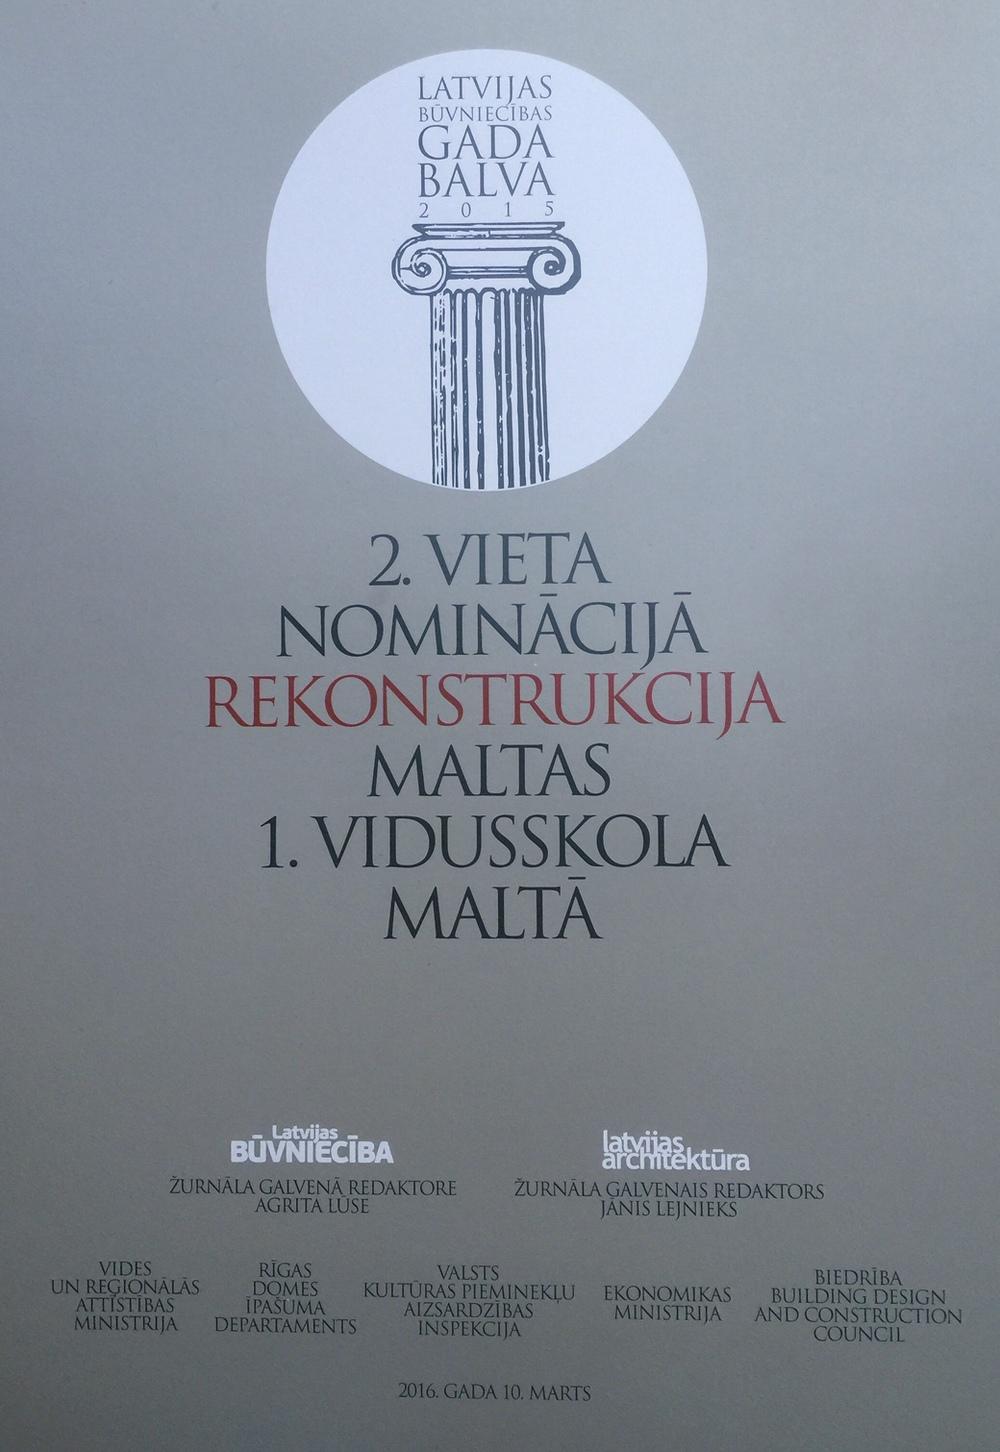 http://www.latvijasbuvnieciba.lv/LB/lb-gadabalva-2015/uzvaretaji/